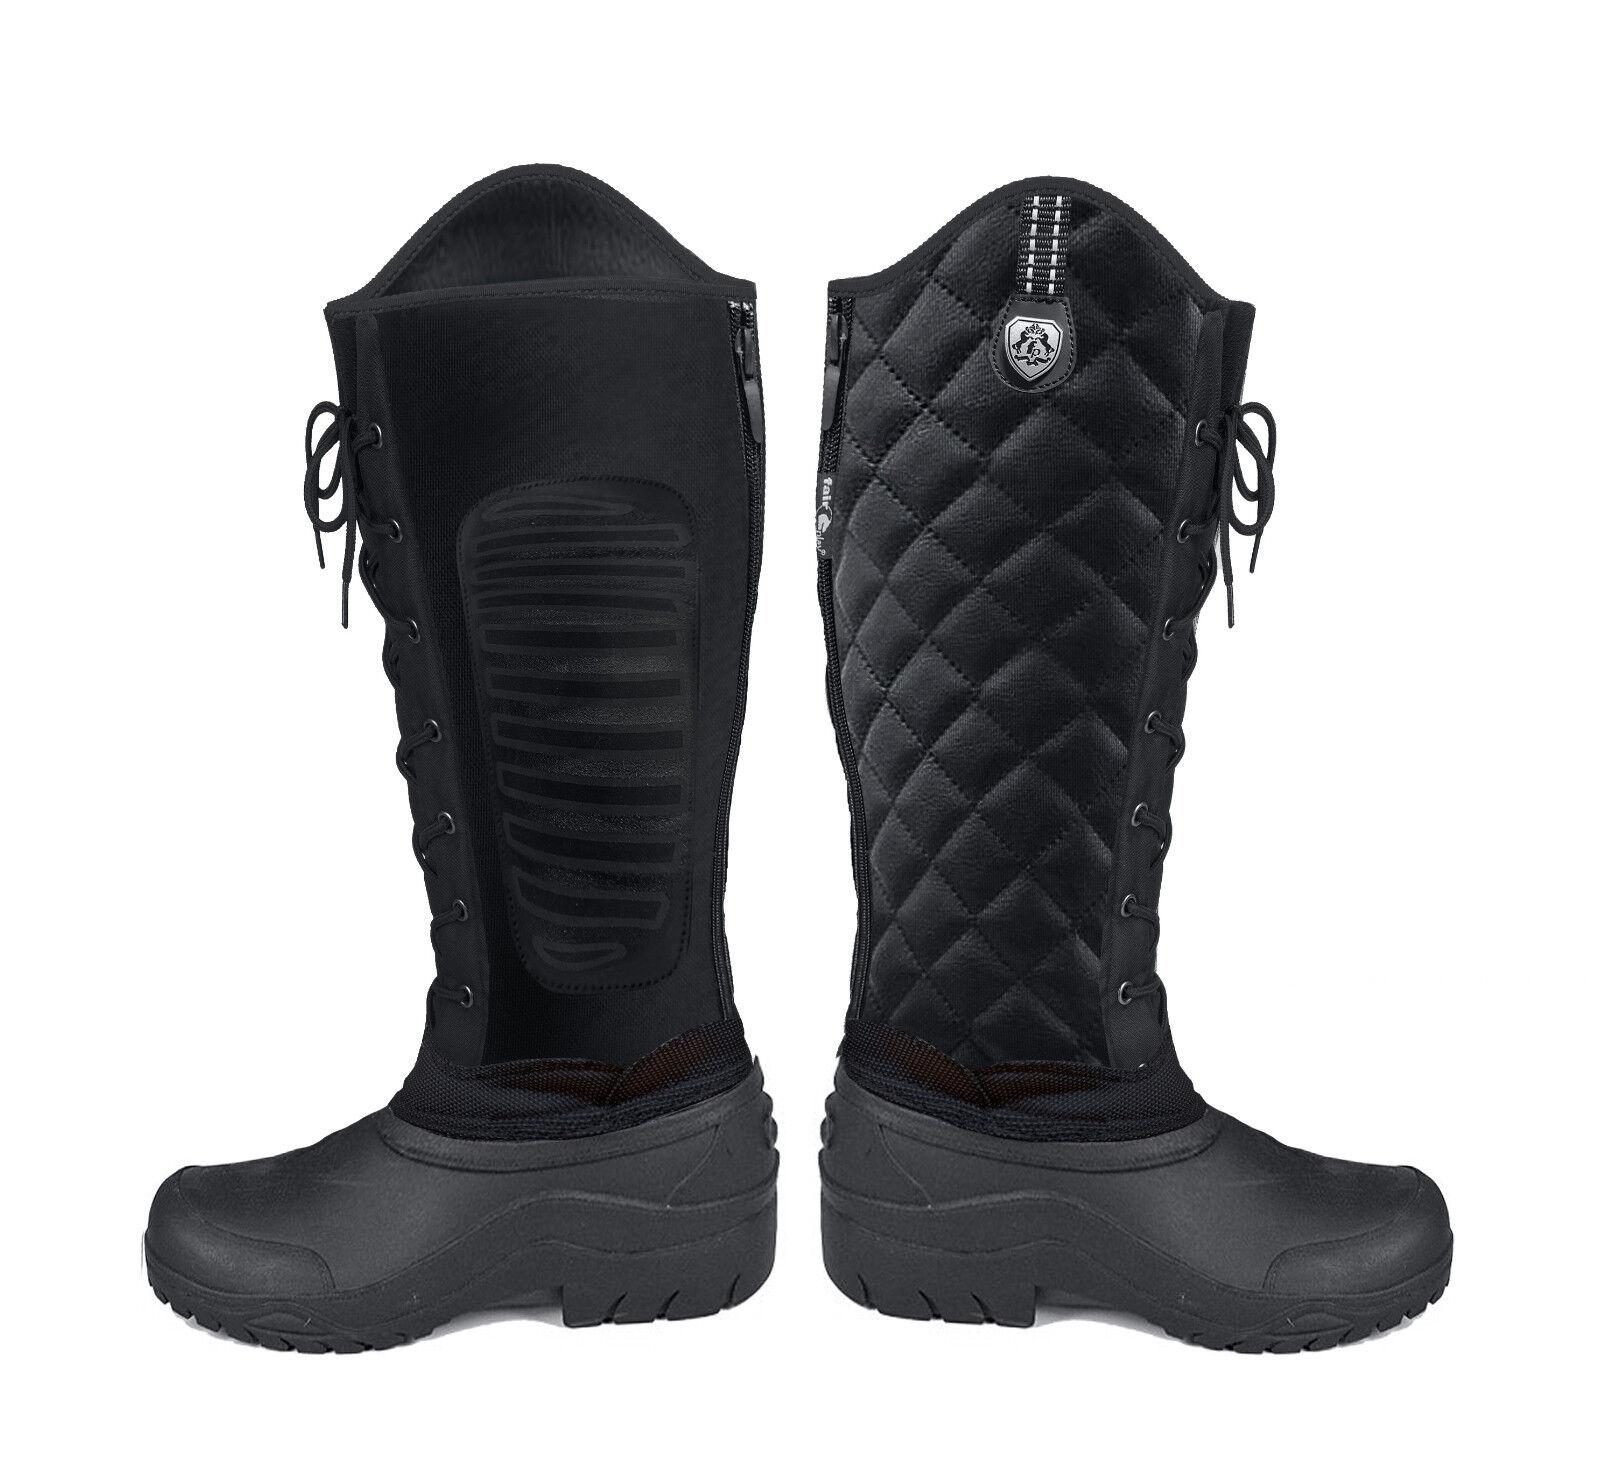 Fair Play Winterreitstiefel Thermo Boots Shiba black Neuheit